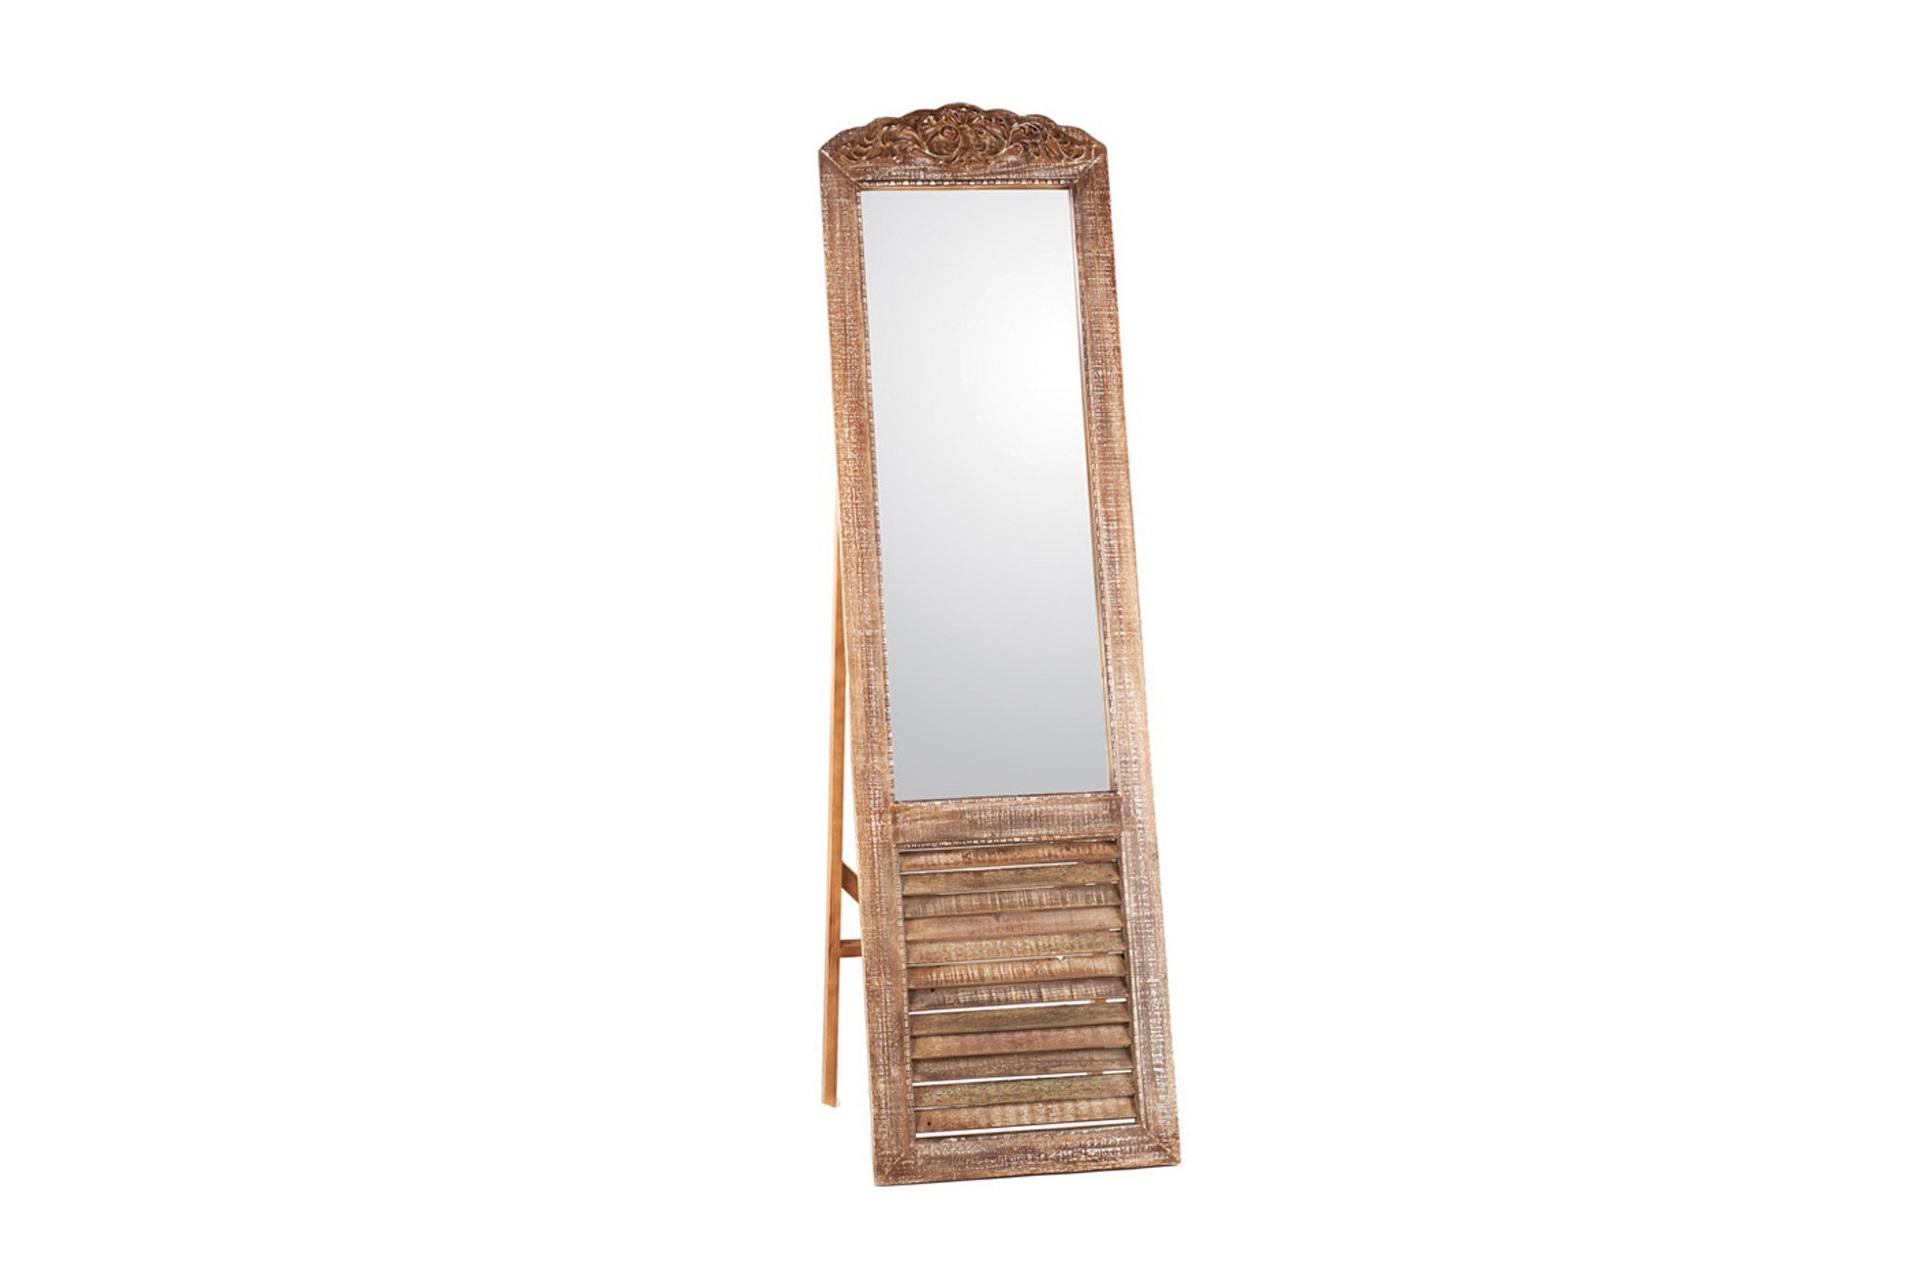 Напольное зеркало  BrewsНапольные зеркала<br>Напольное зеркало<br><br>Material: Дерево<br>Width см: 48<br>Depth см: 6<br>Height см: 170